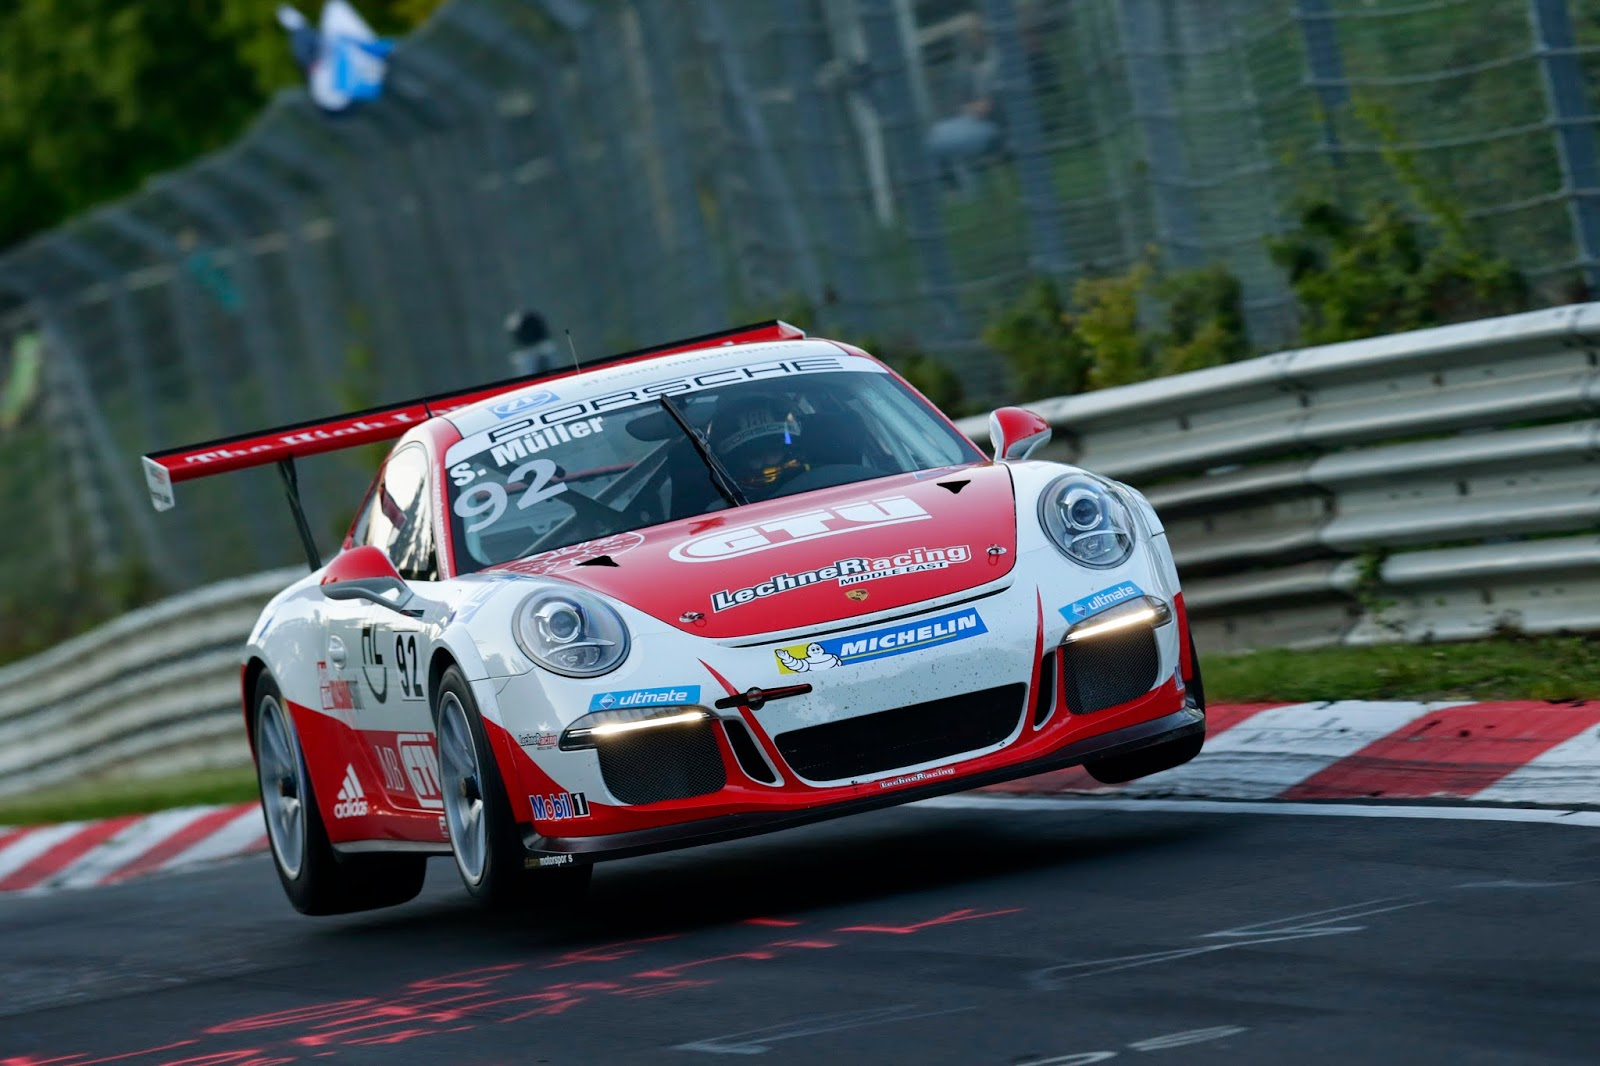 Imsa Live Stream >> Axis Of Oversteer: Nürburgring 24 Hours Live stream on YouTube